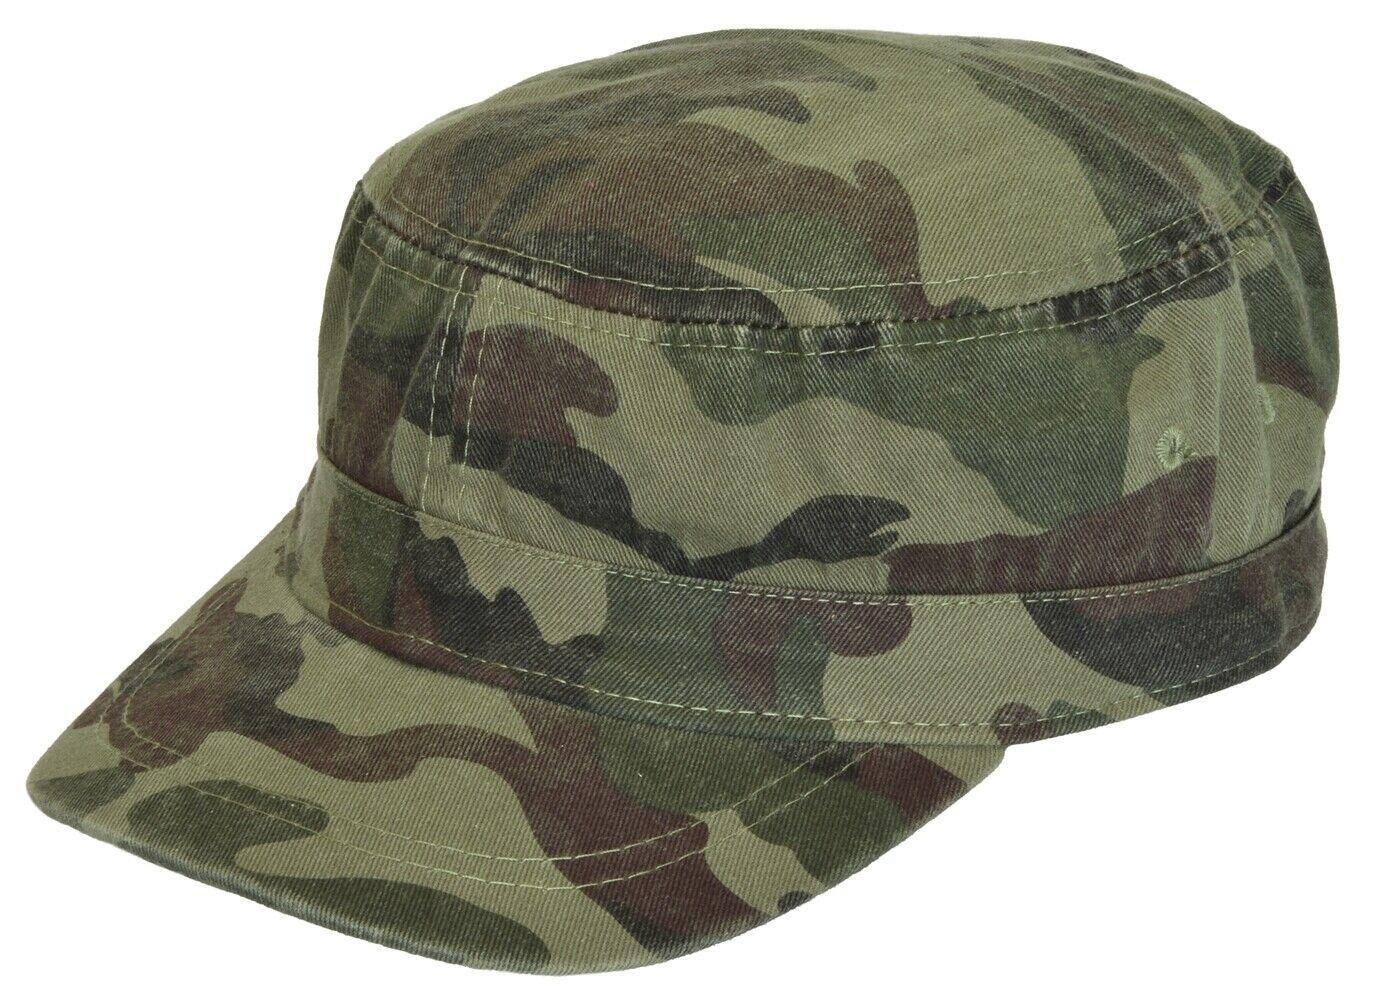 Unisex Kadettenkappe Tarnkappe Basecap Mütze Cap Kappe Schirmmütze